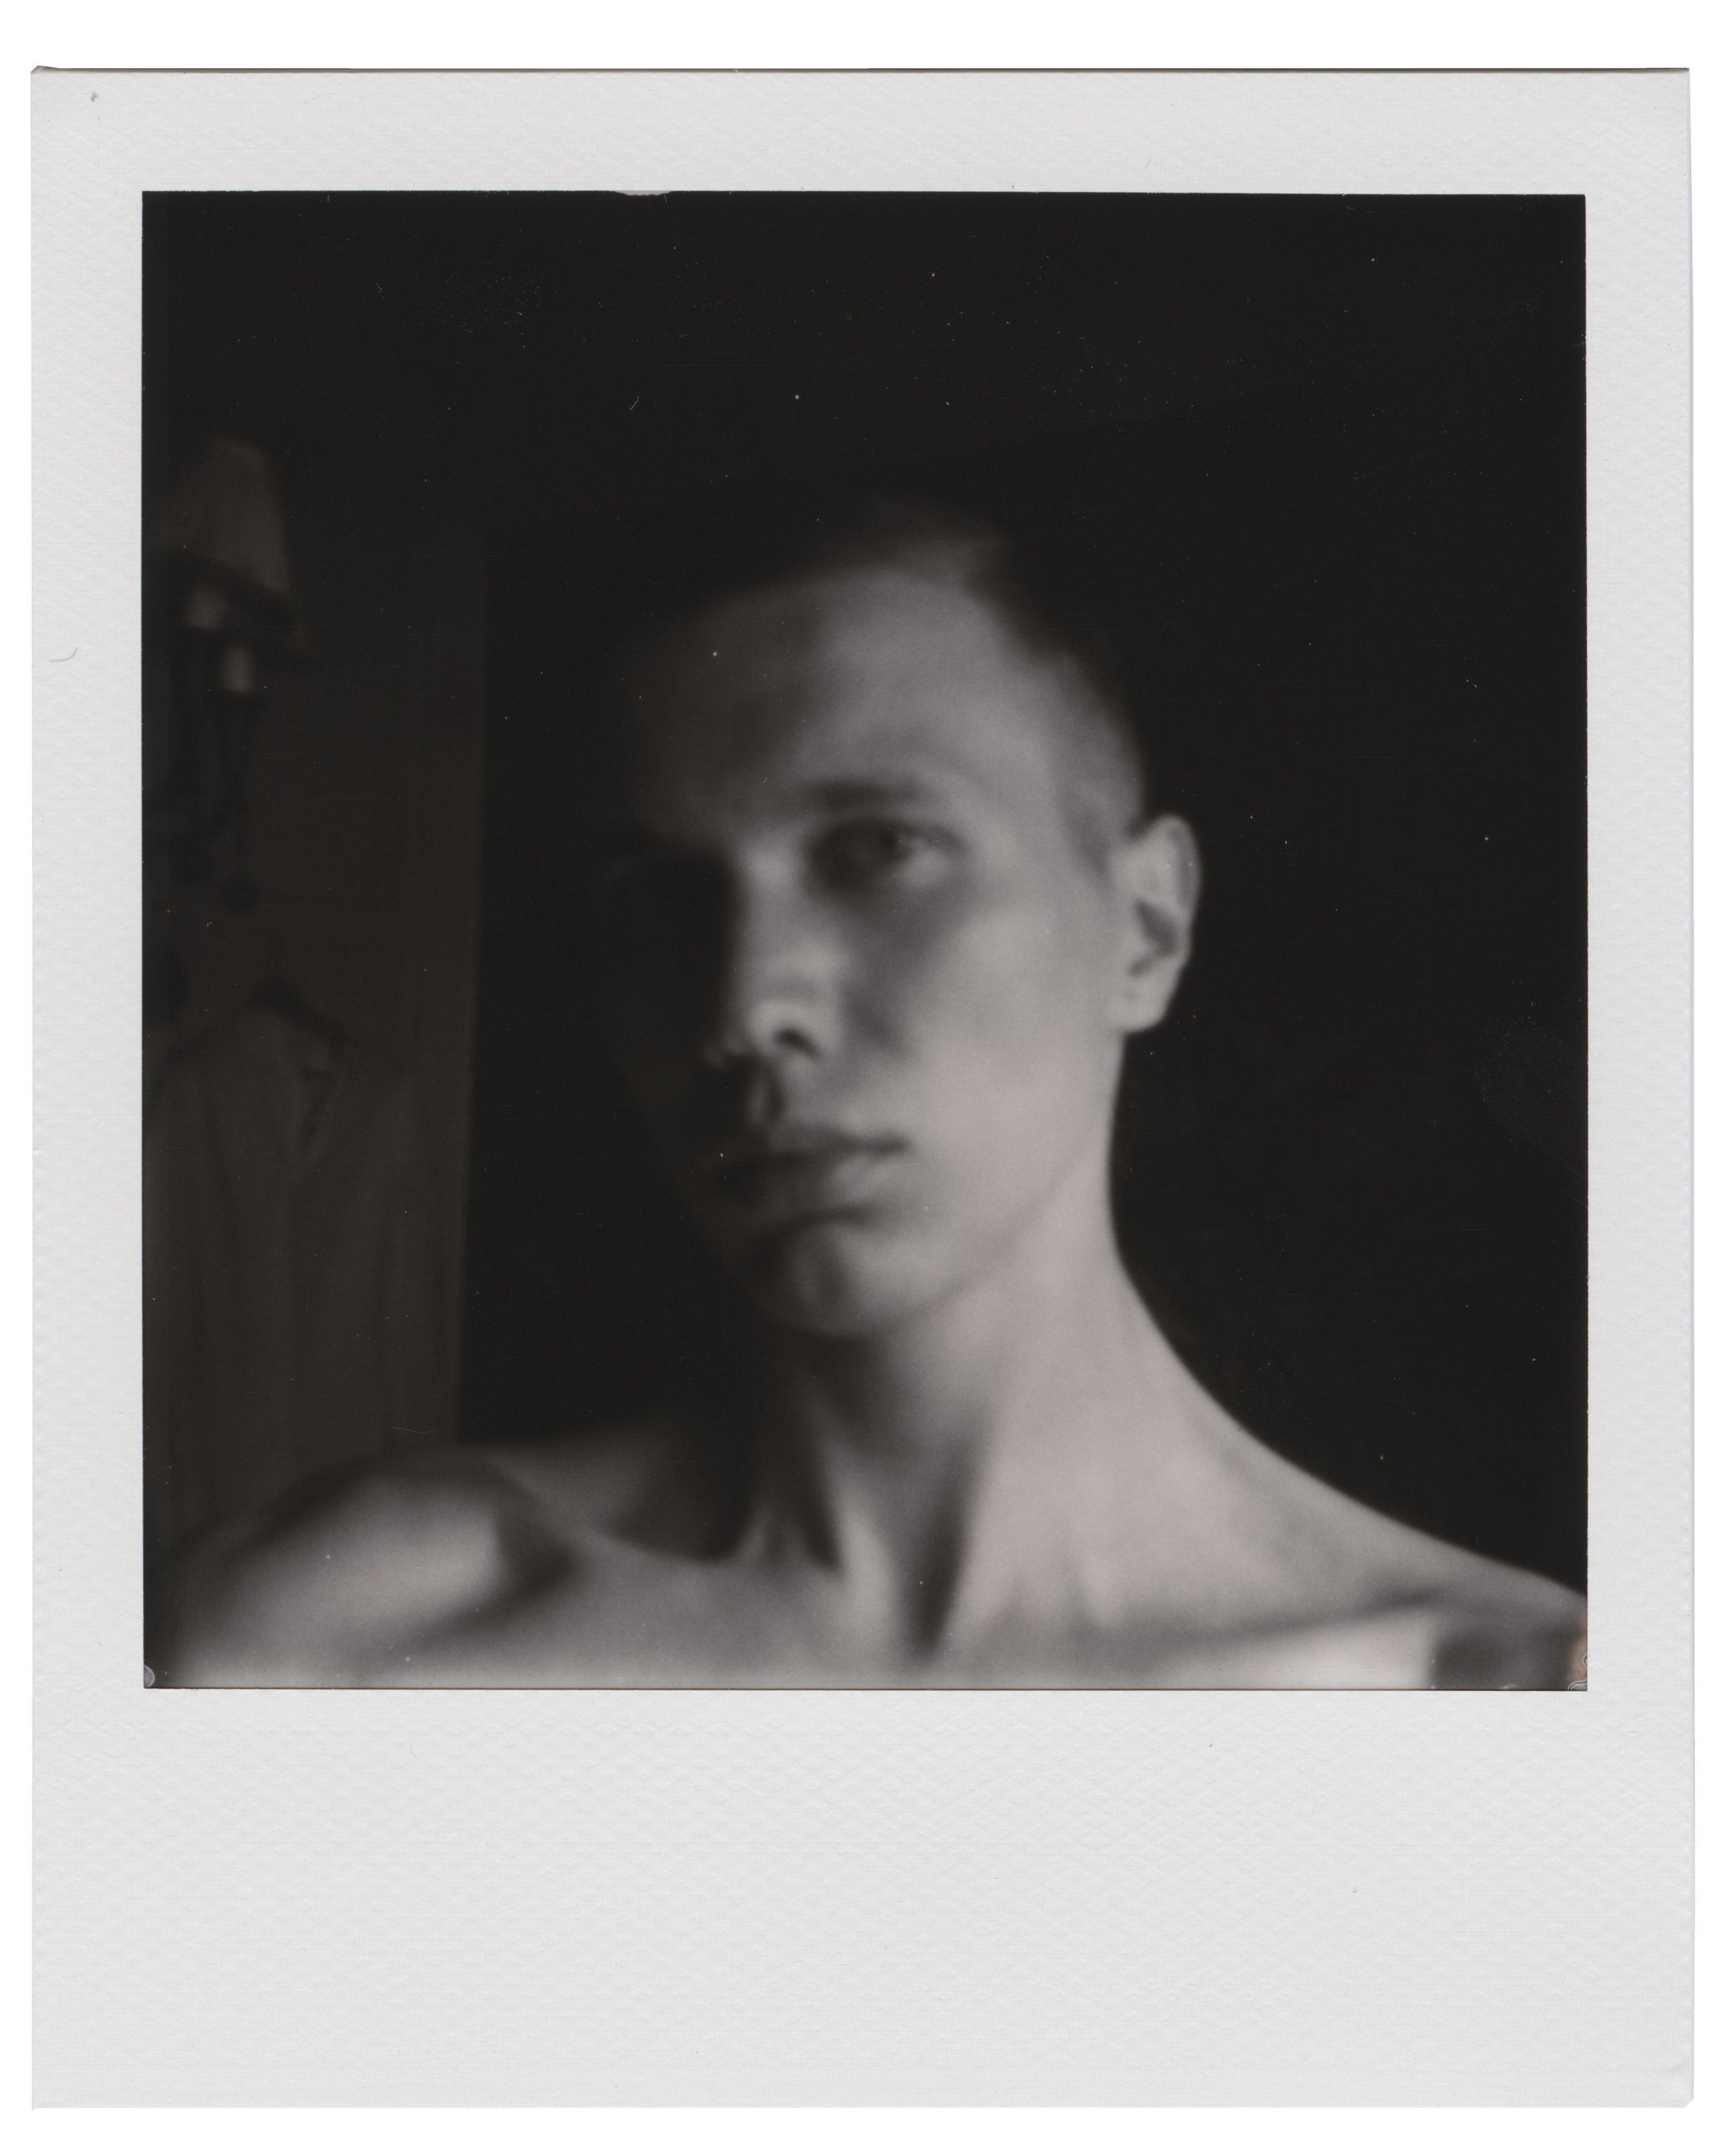 Self-portrait, June 2 2018 (Polaroid 600) Thobias Malmberg